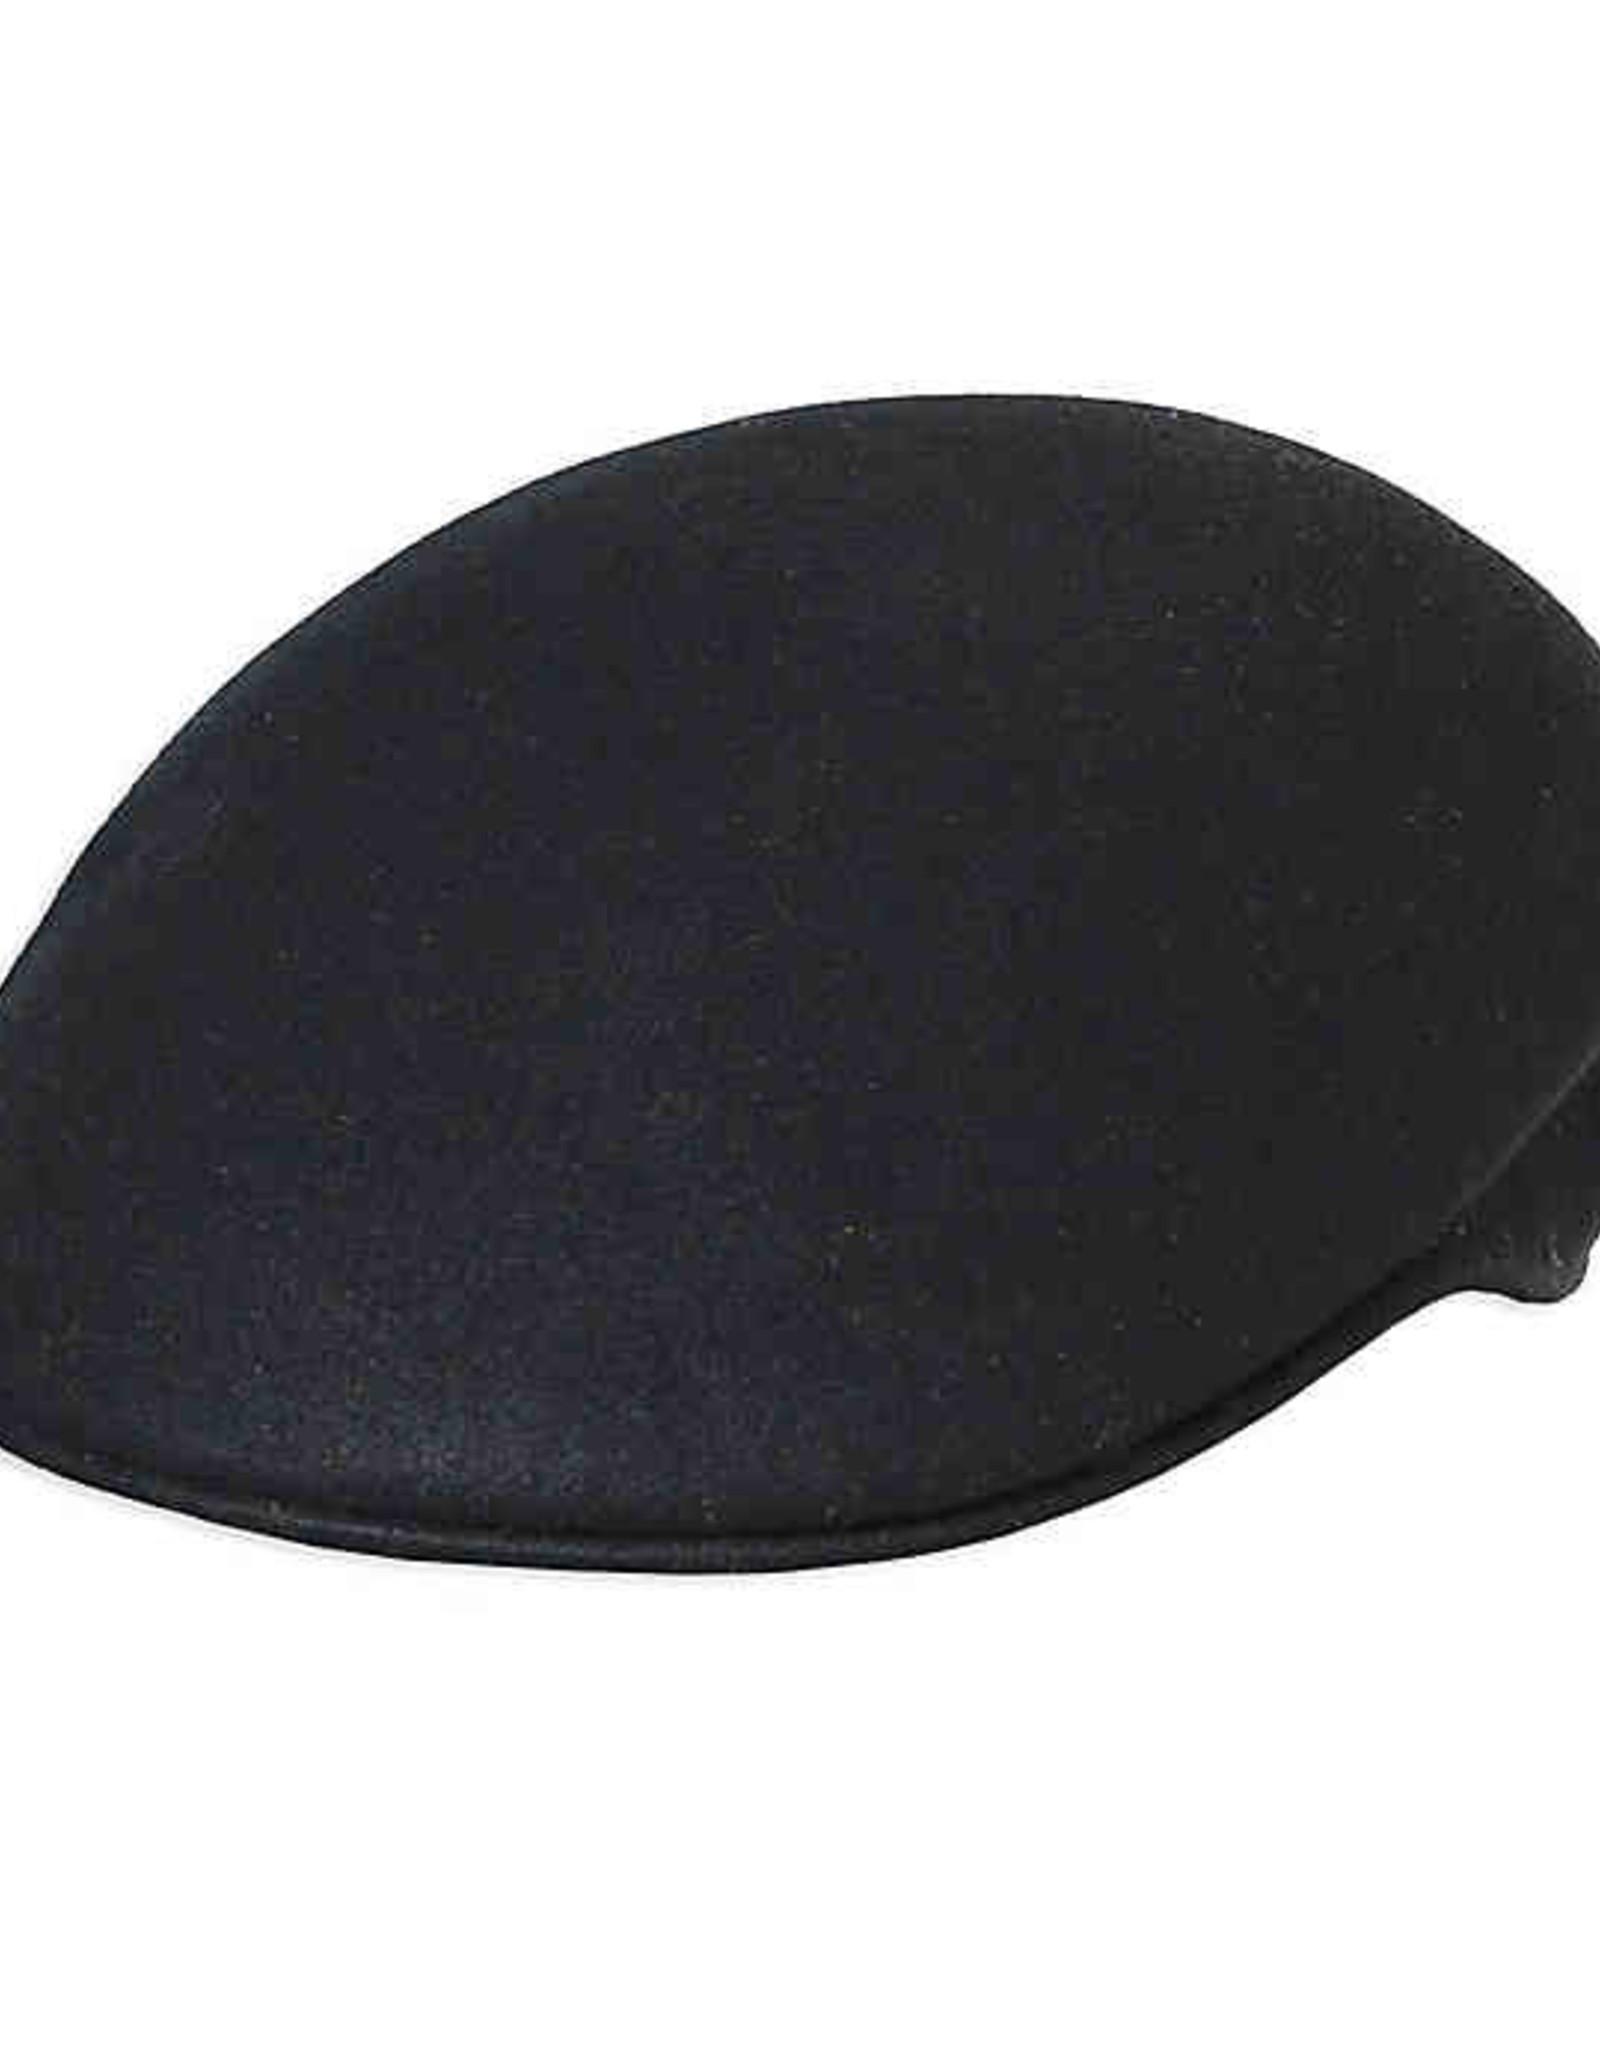 HAT-DRIVER-ASCOT, CRUSHABLE